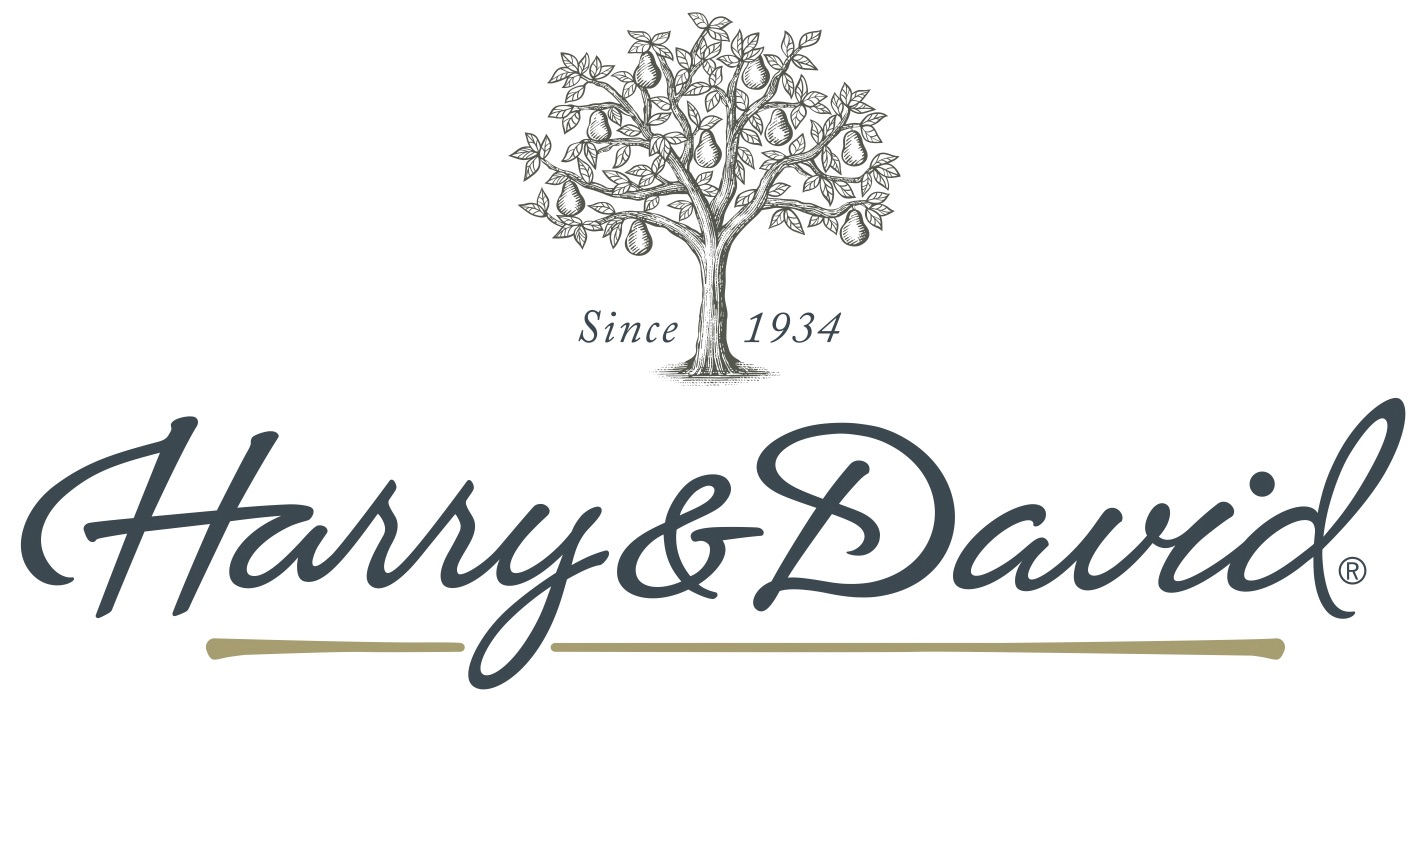 Harry and david free shipping coupon code 2018